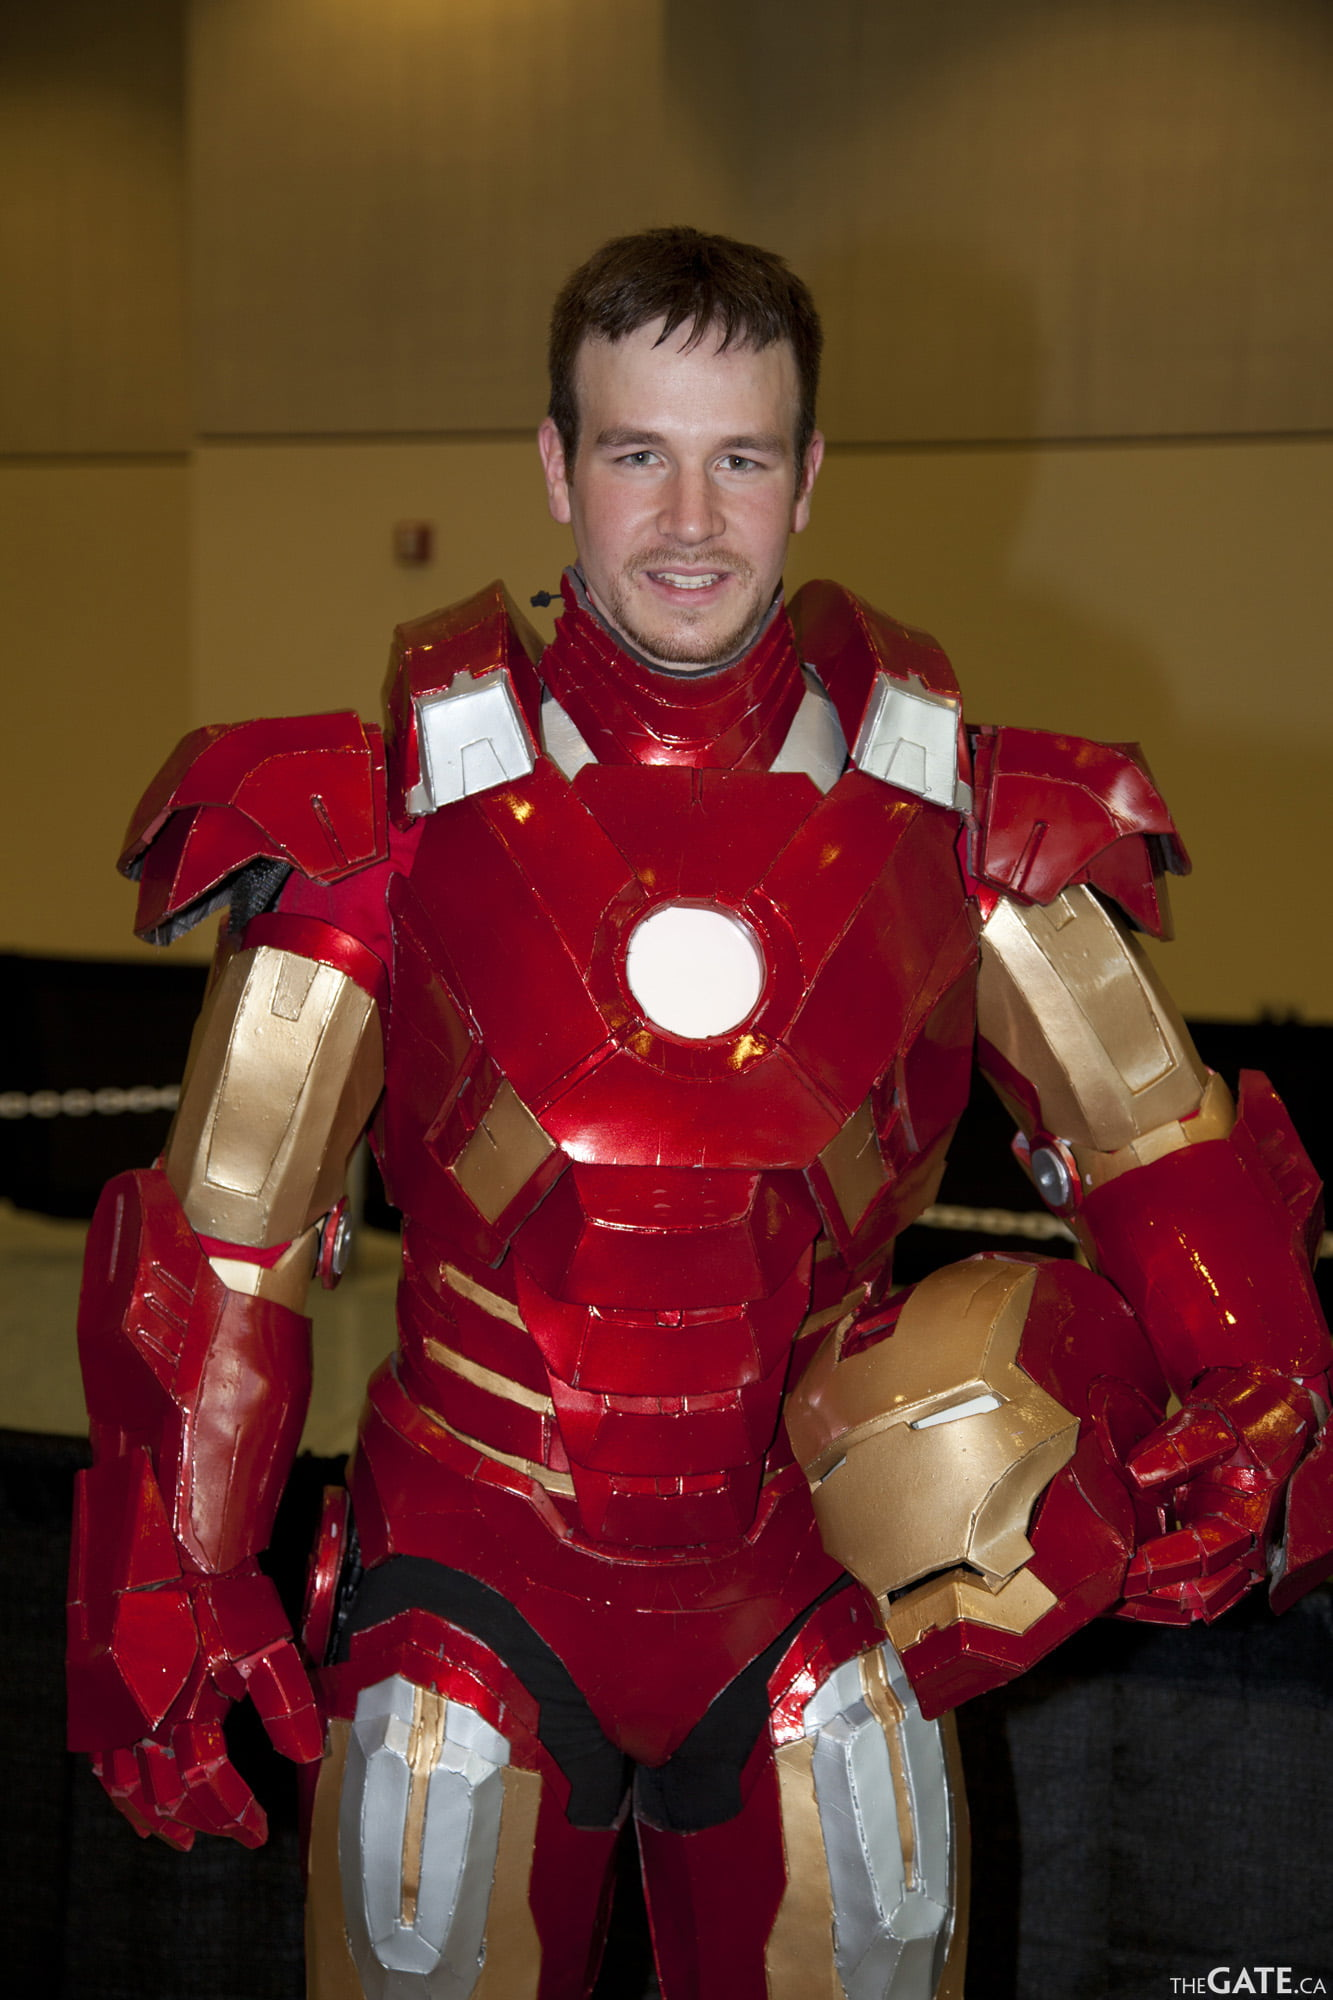 Owen as Iron Man